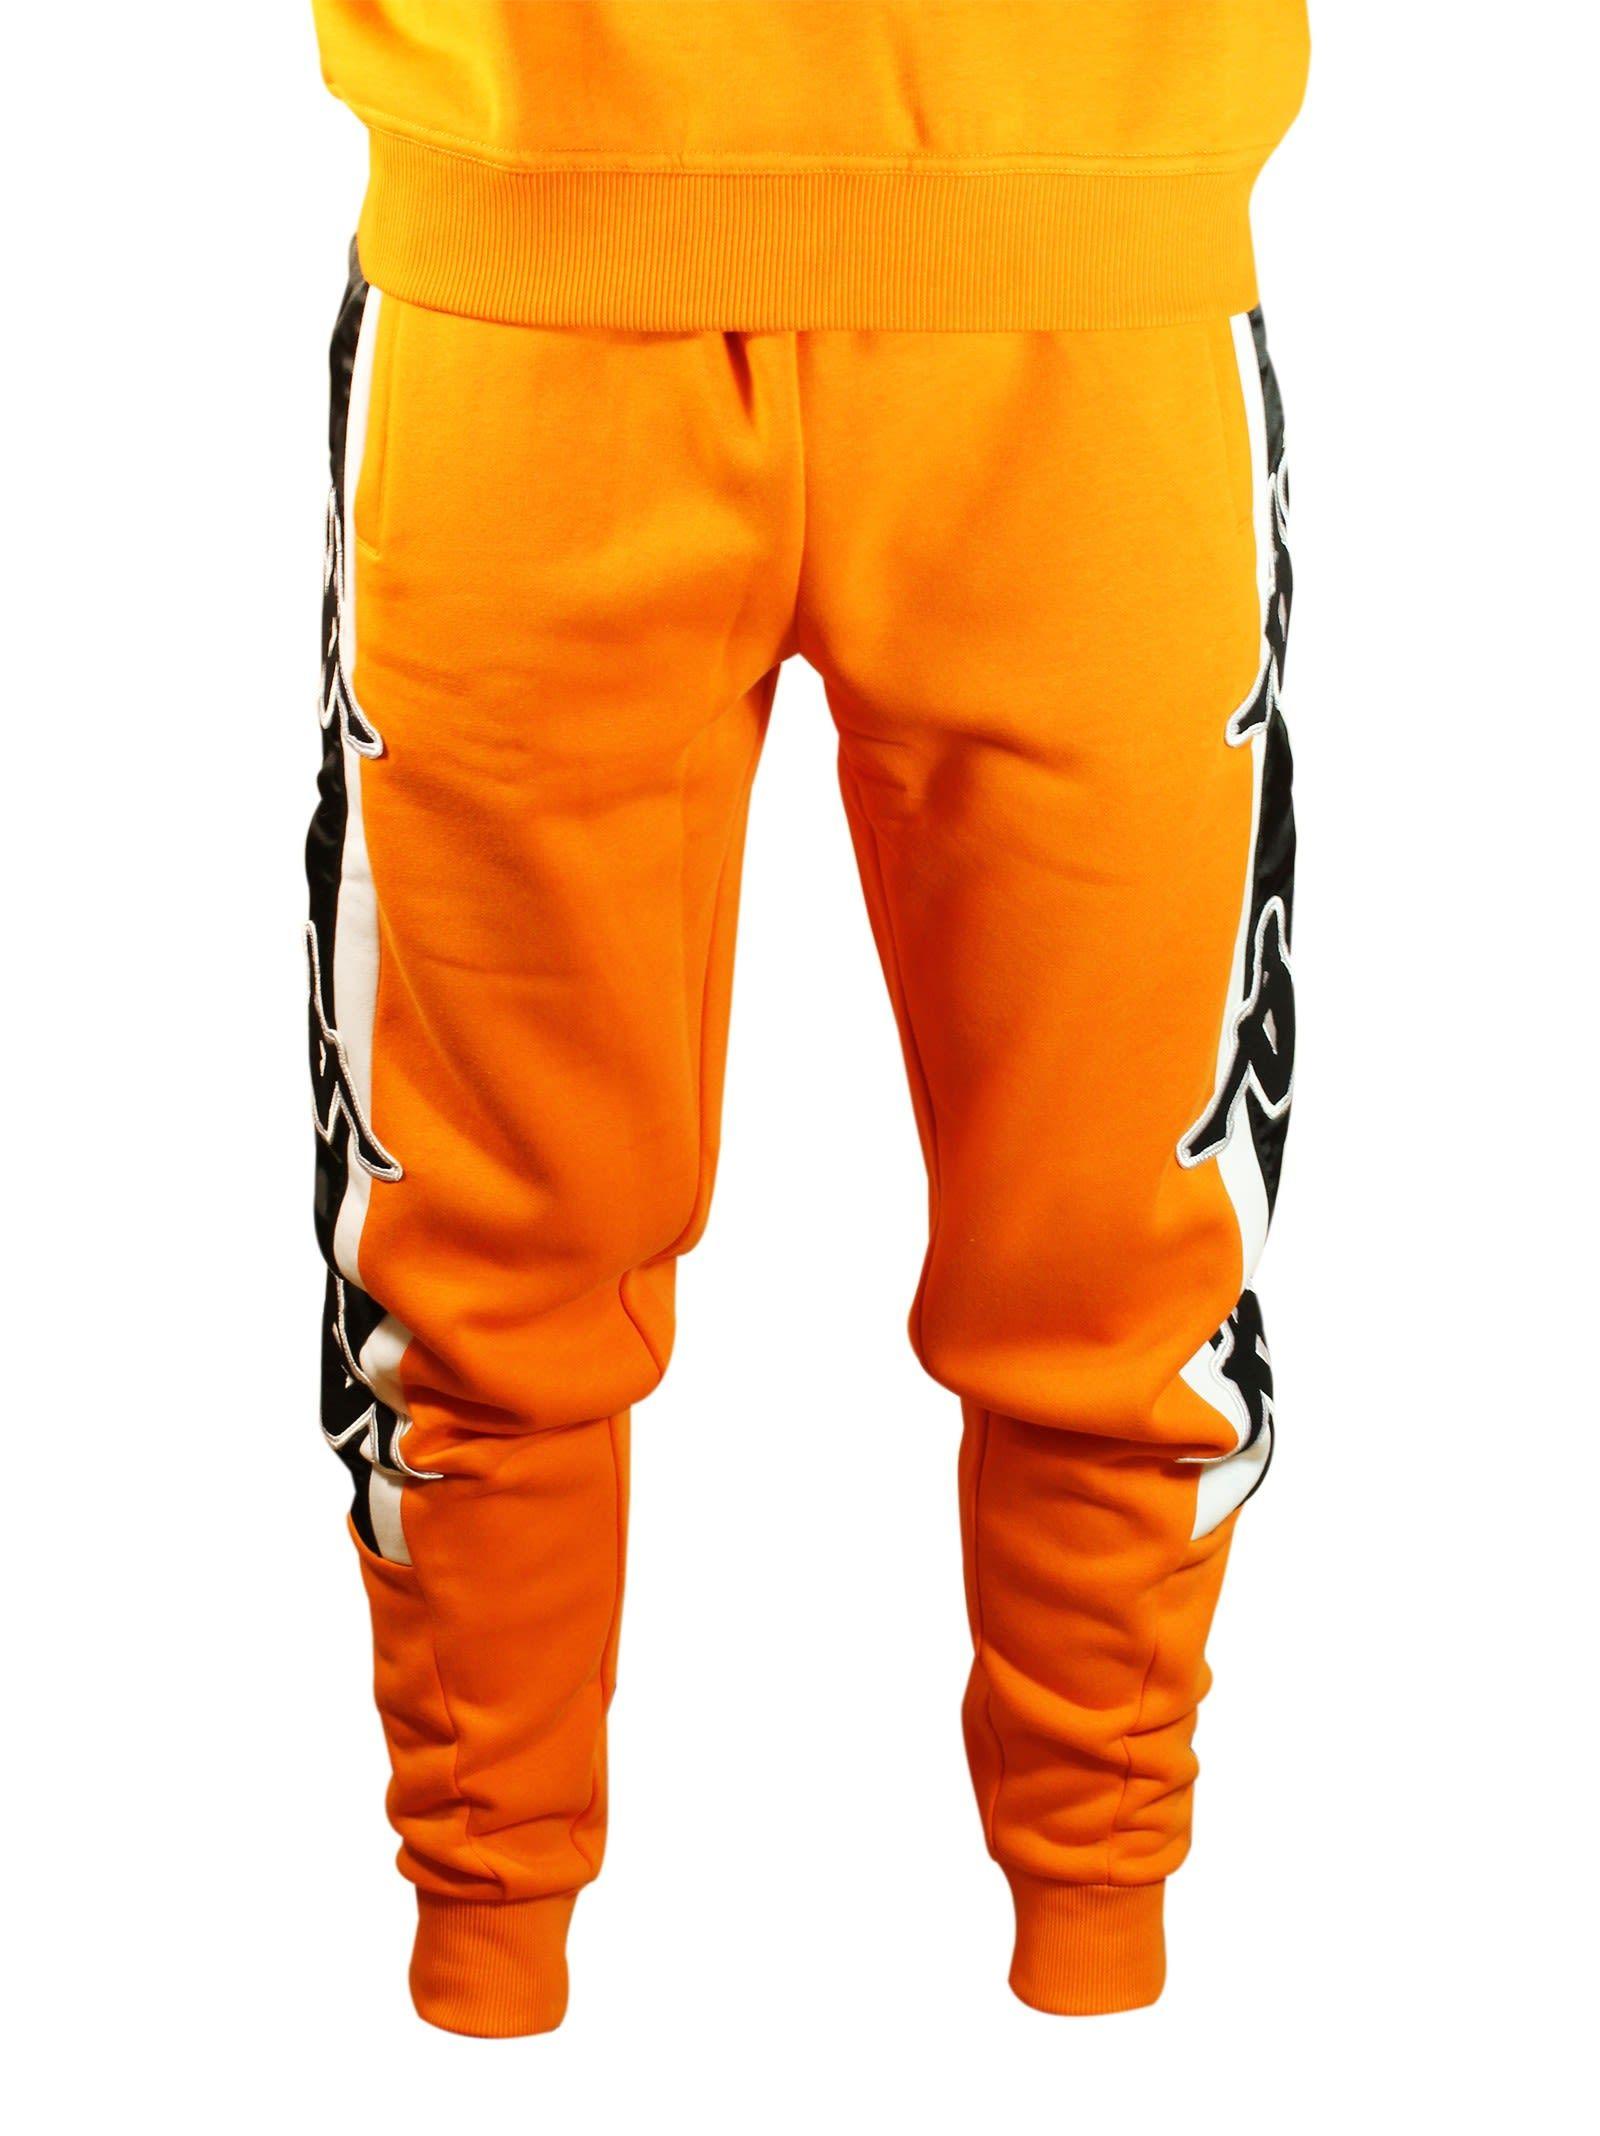 c4511a3c KAPPA Kontroll Big Omini Sweatpants in Orange | MENS FASHION in 2019 ...